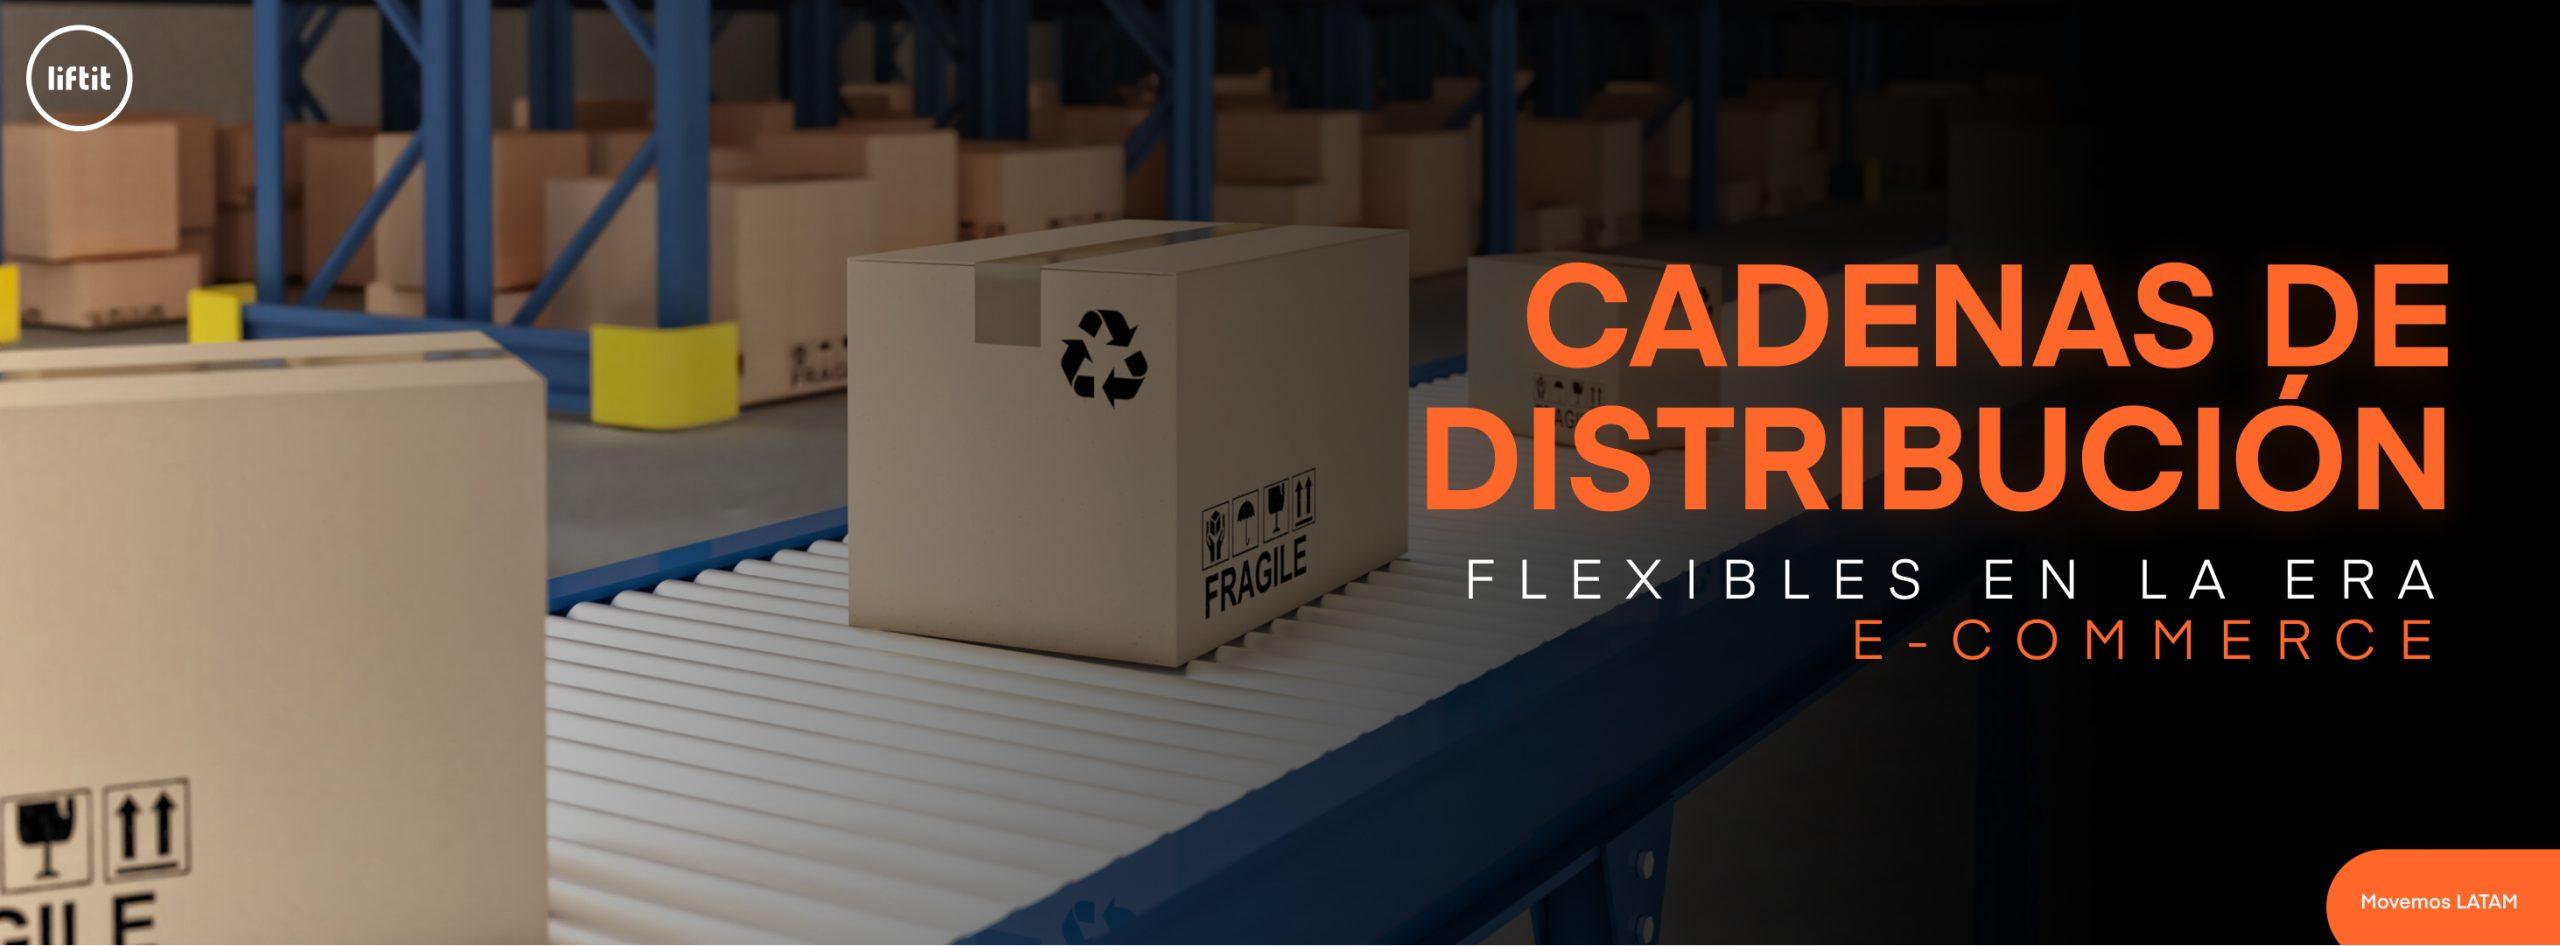 cadenas de distribucion flexibles en la era ecommerce